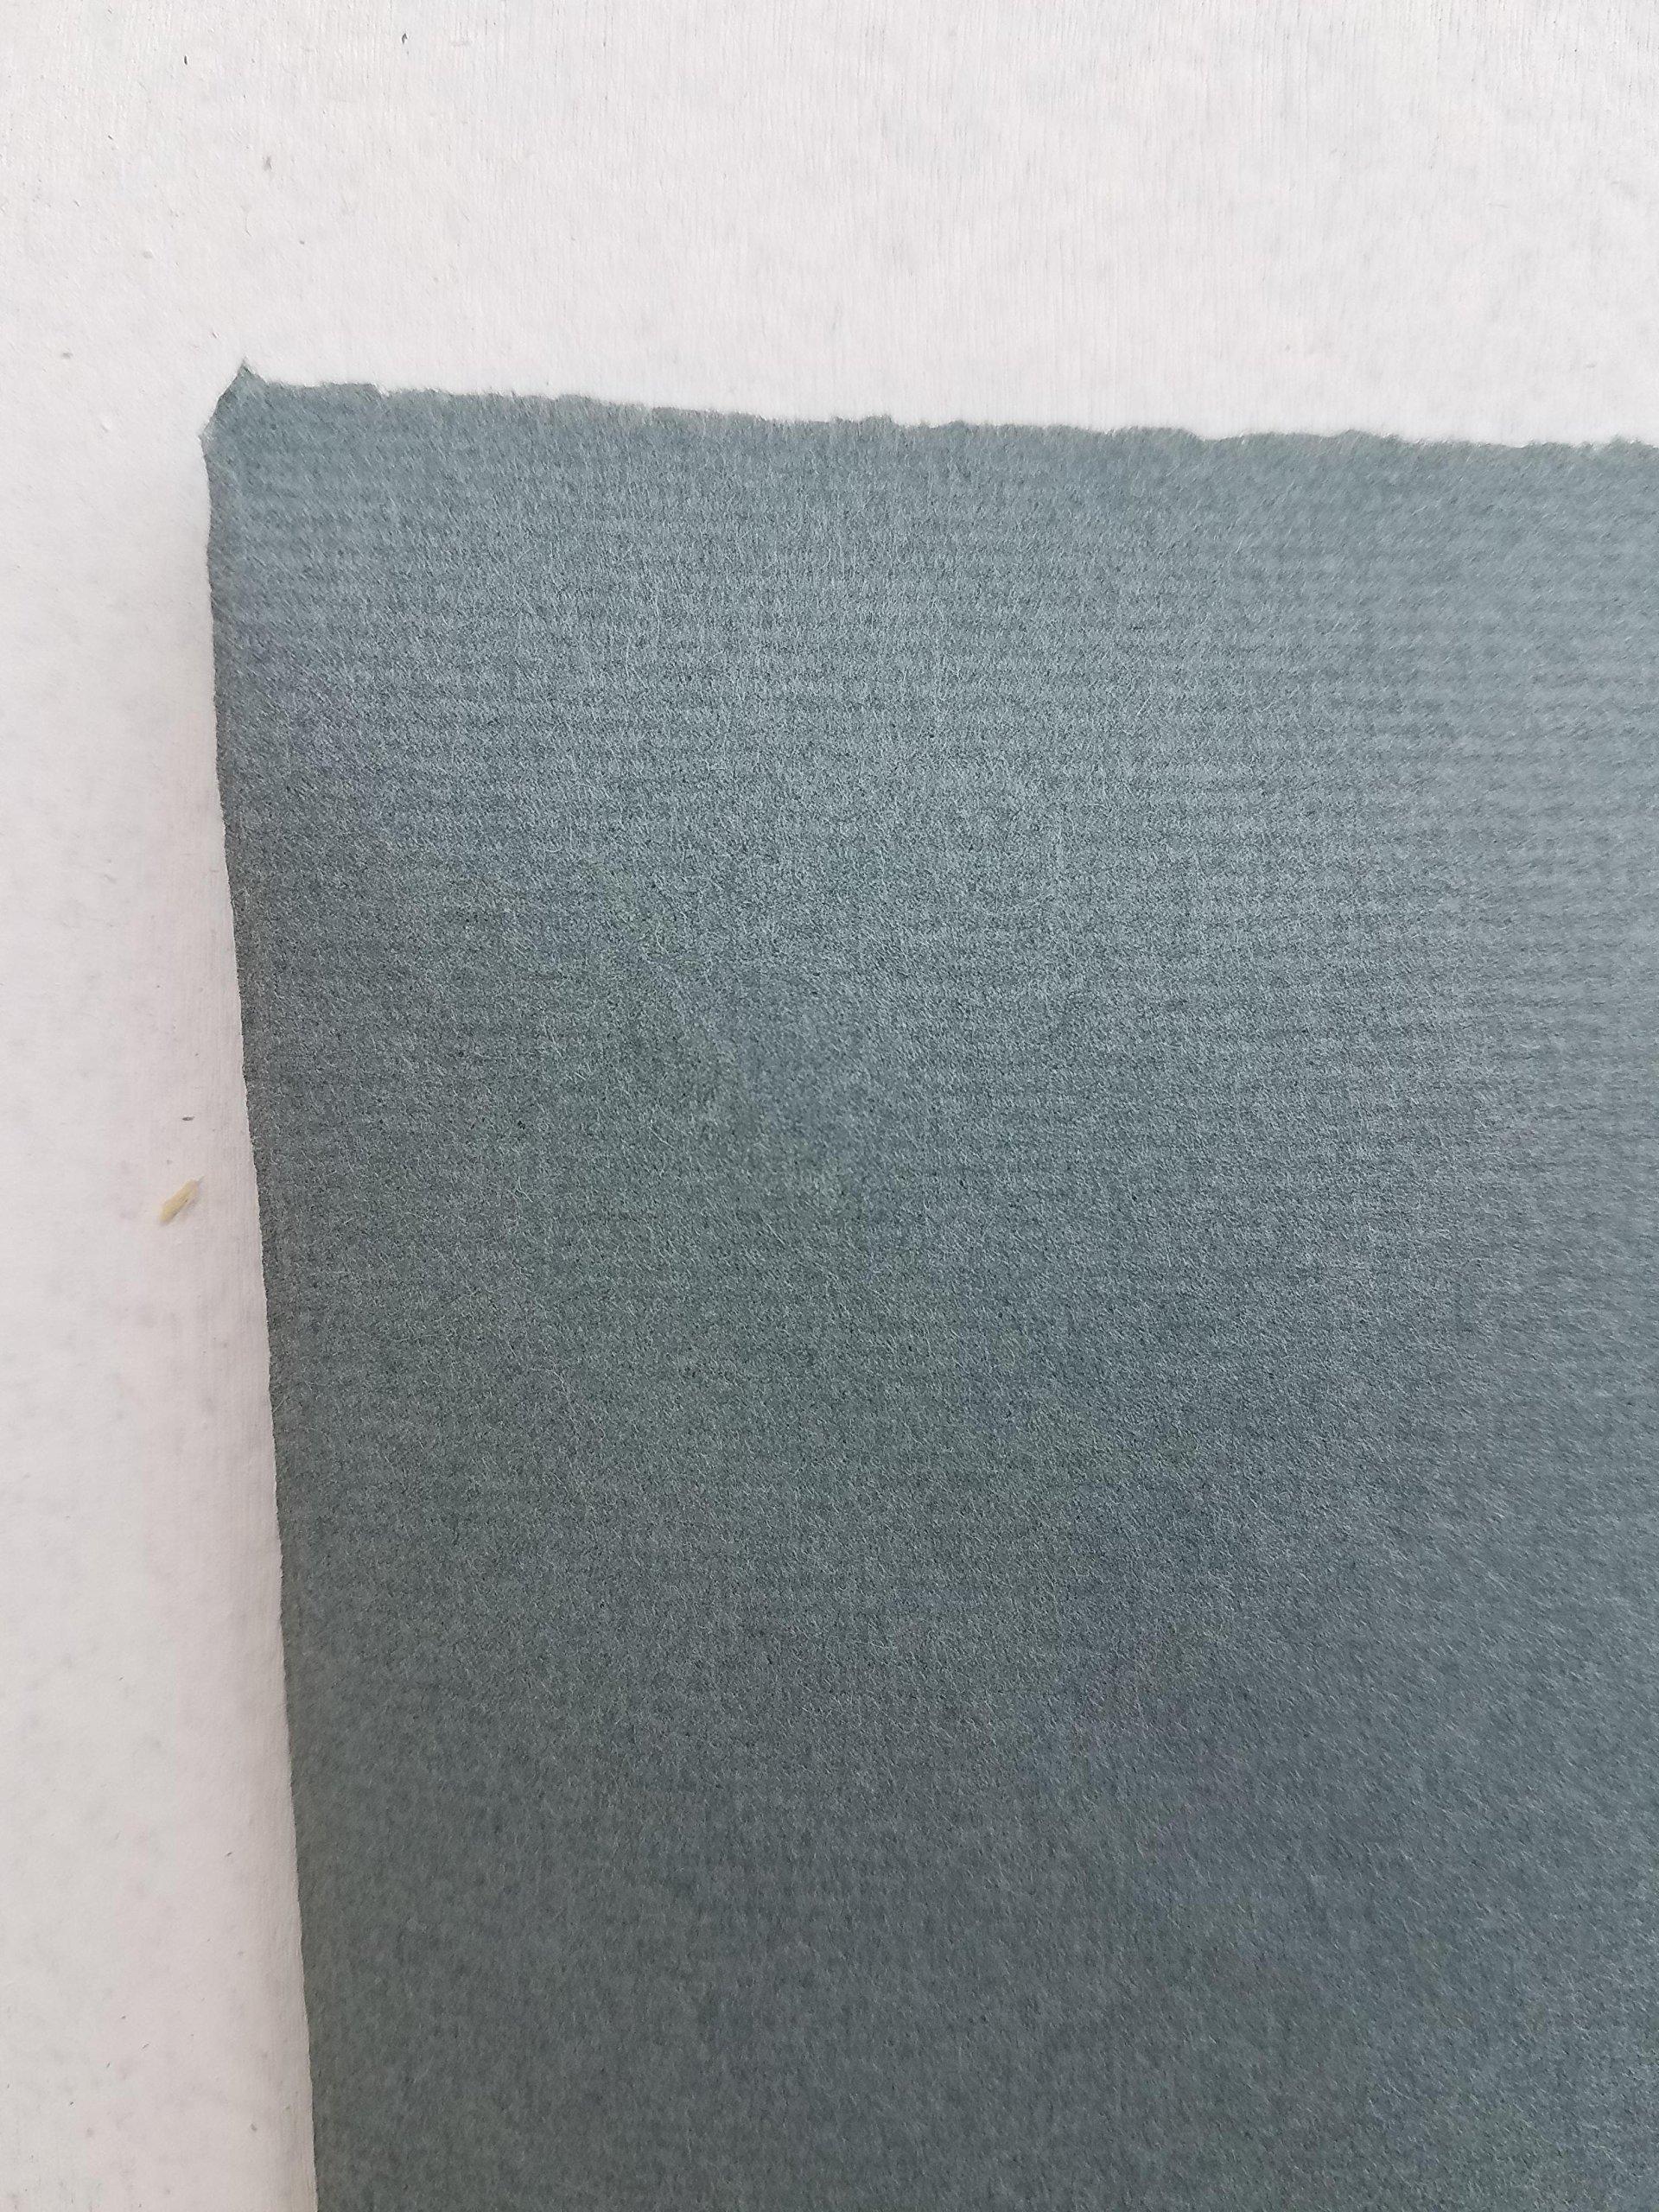 Hahnemuhle Ingres Paper, Blue/Grey 112, 19'' X 25'', 100 gsm (25 Sheet Package) by Hahnemuhle Ingres Antique